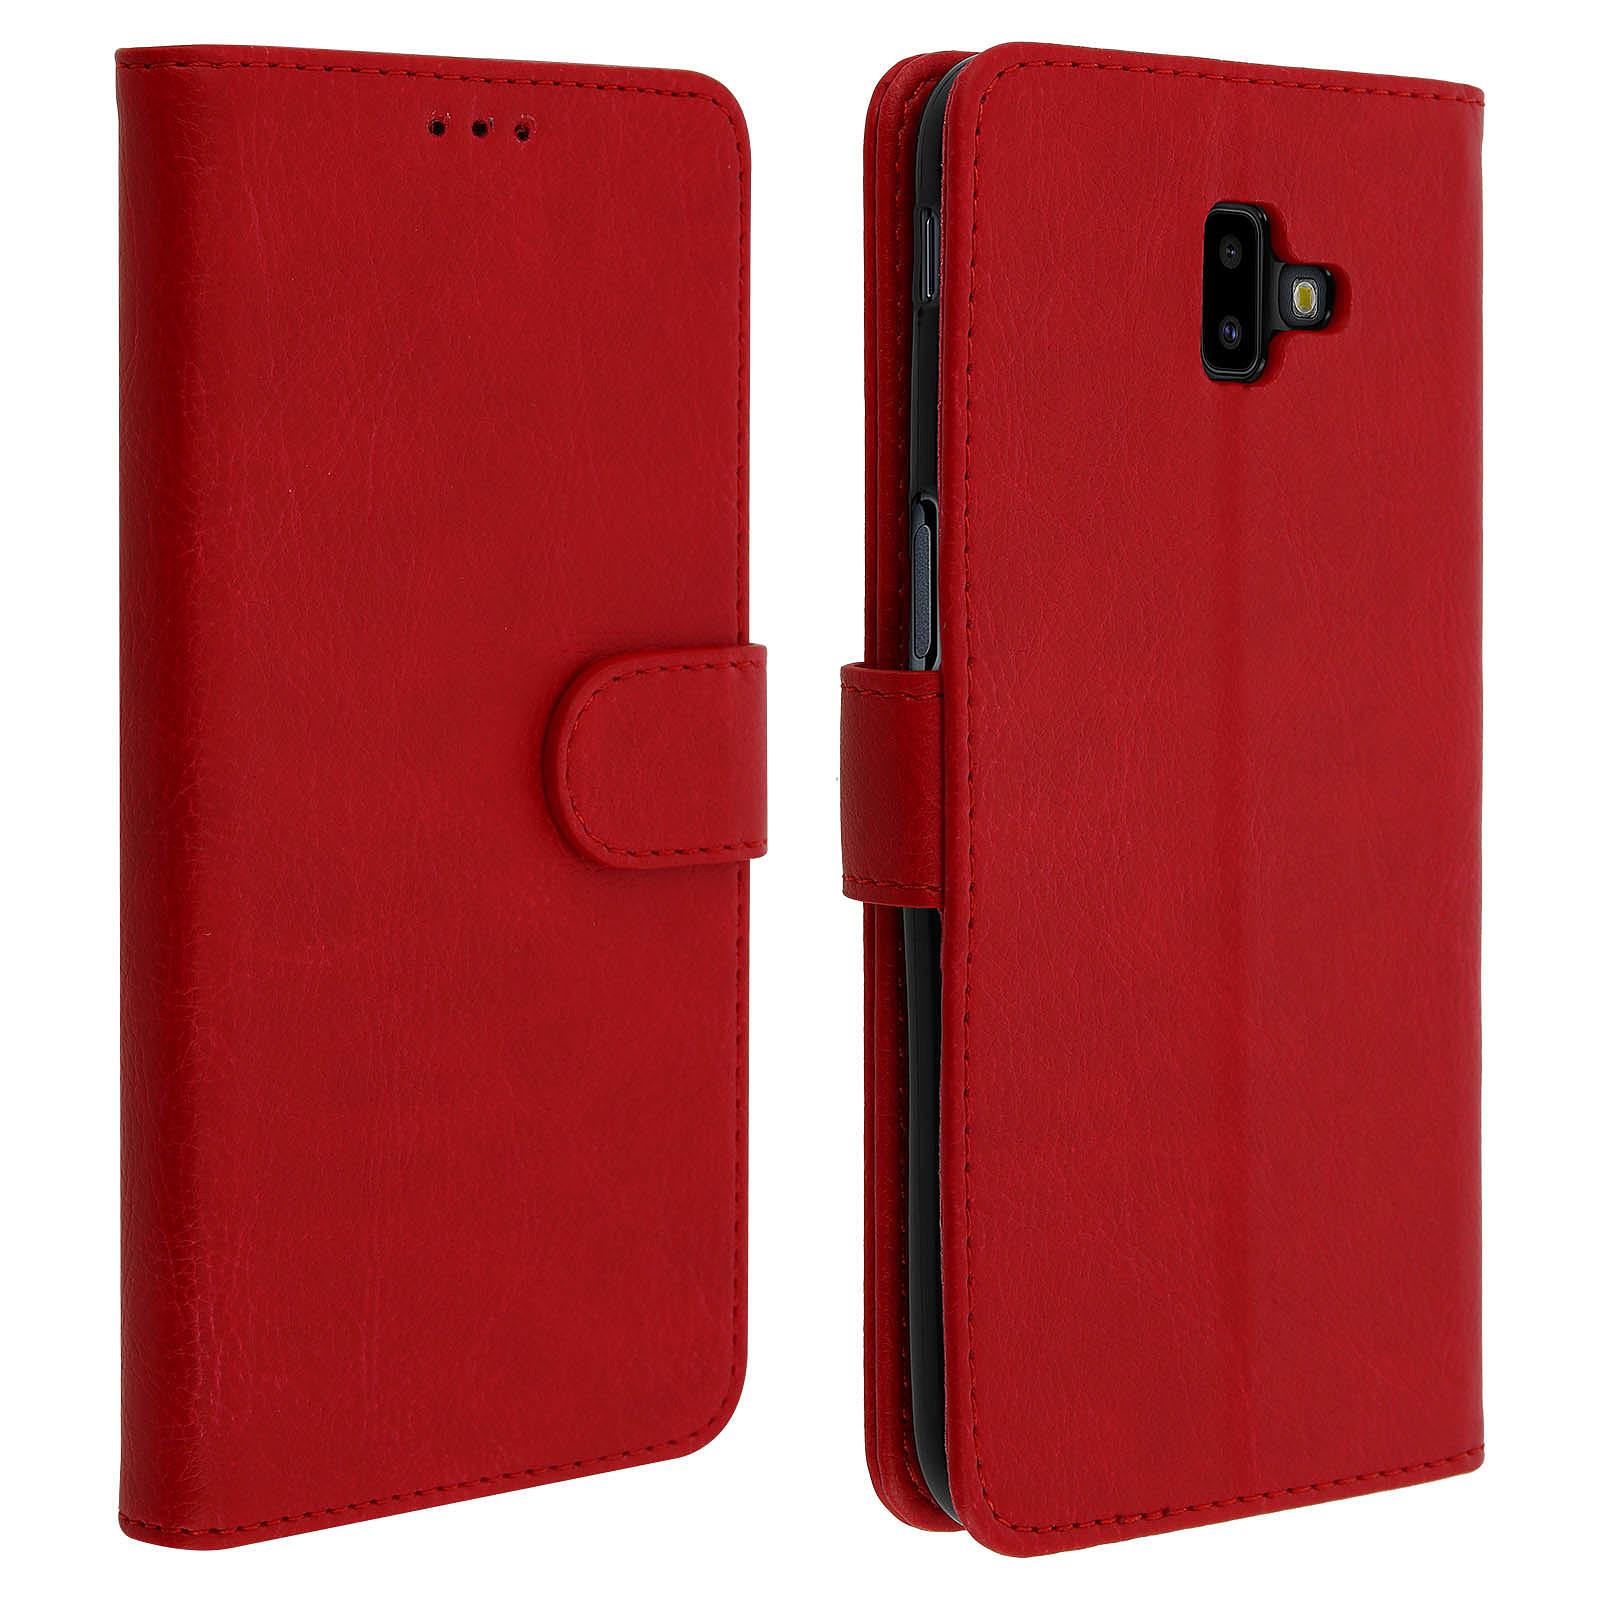 Avizar Etui folio Rouge Porte-Carte pour Samsung Galaxy J6 Plus